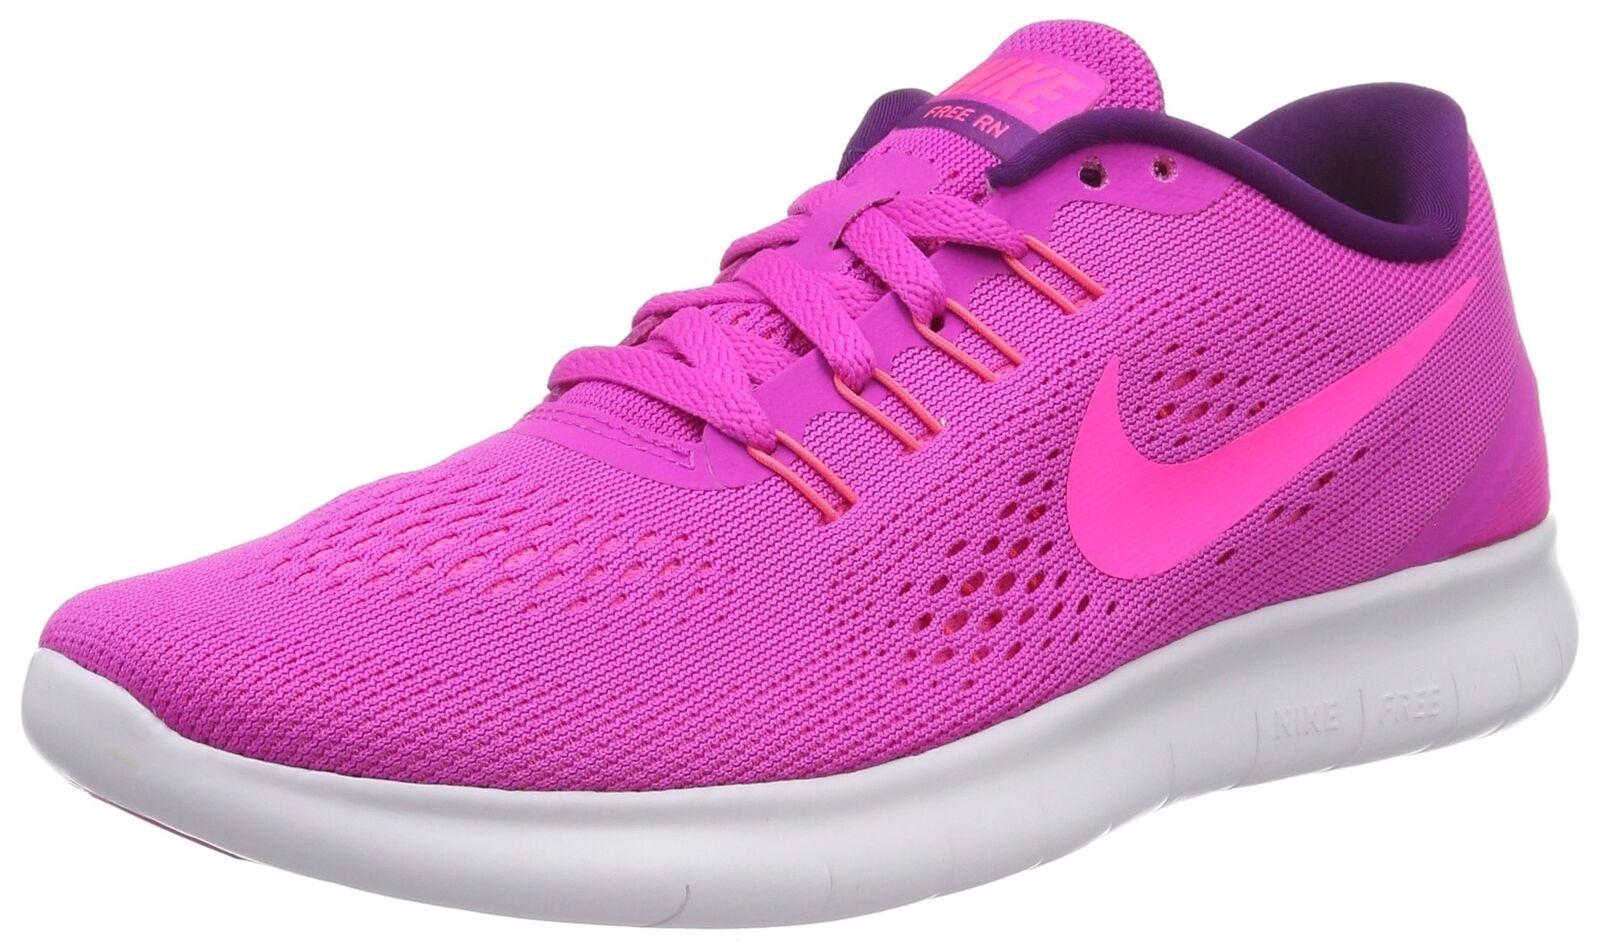 Nike Womens Free RN Running shoes (9.5 B(M) US, Fire Pink bluee Glow Light Vio...